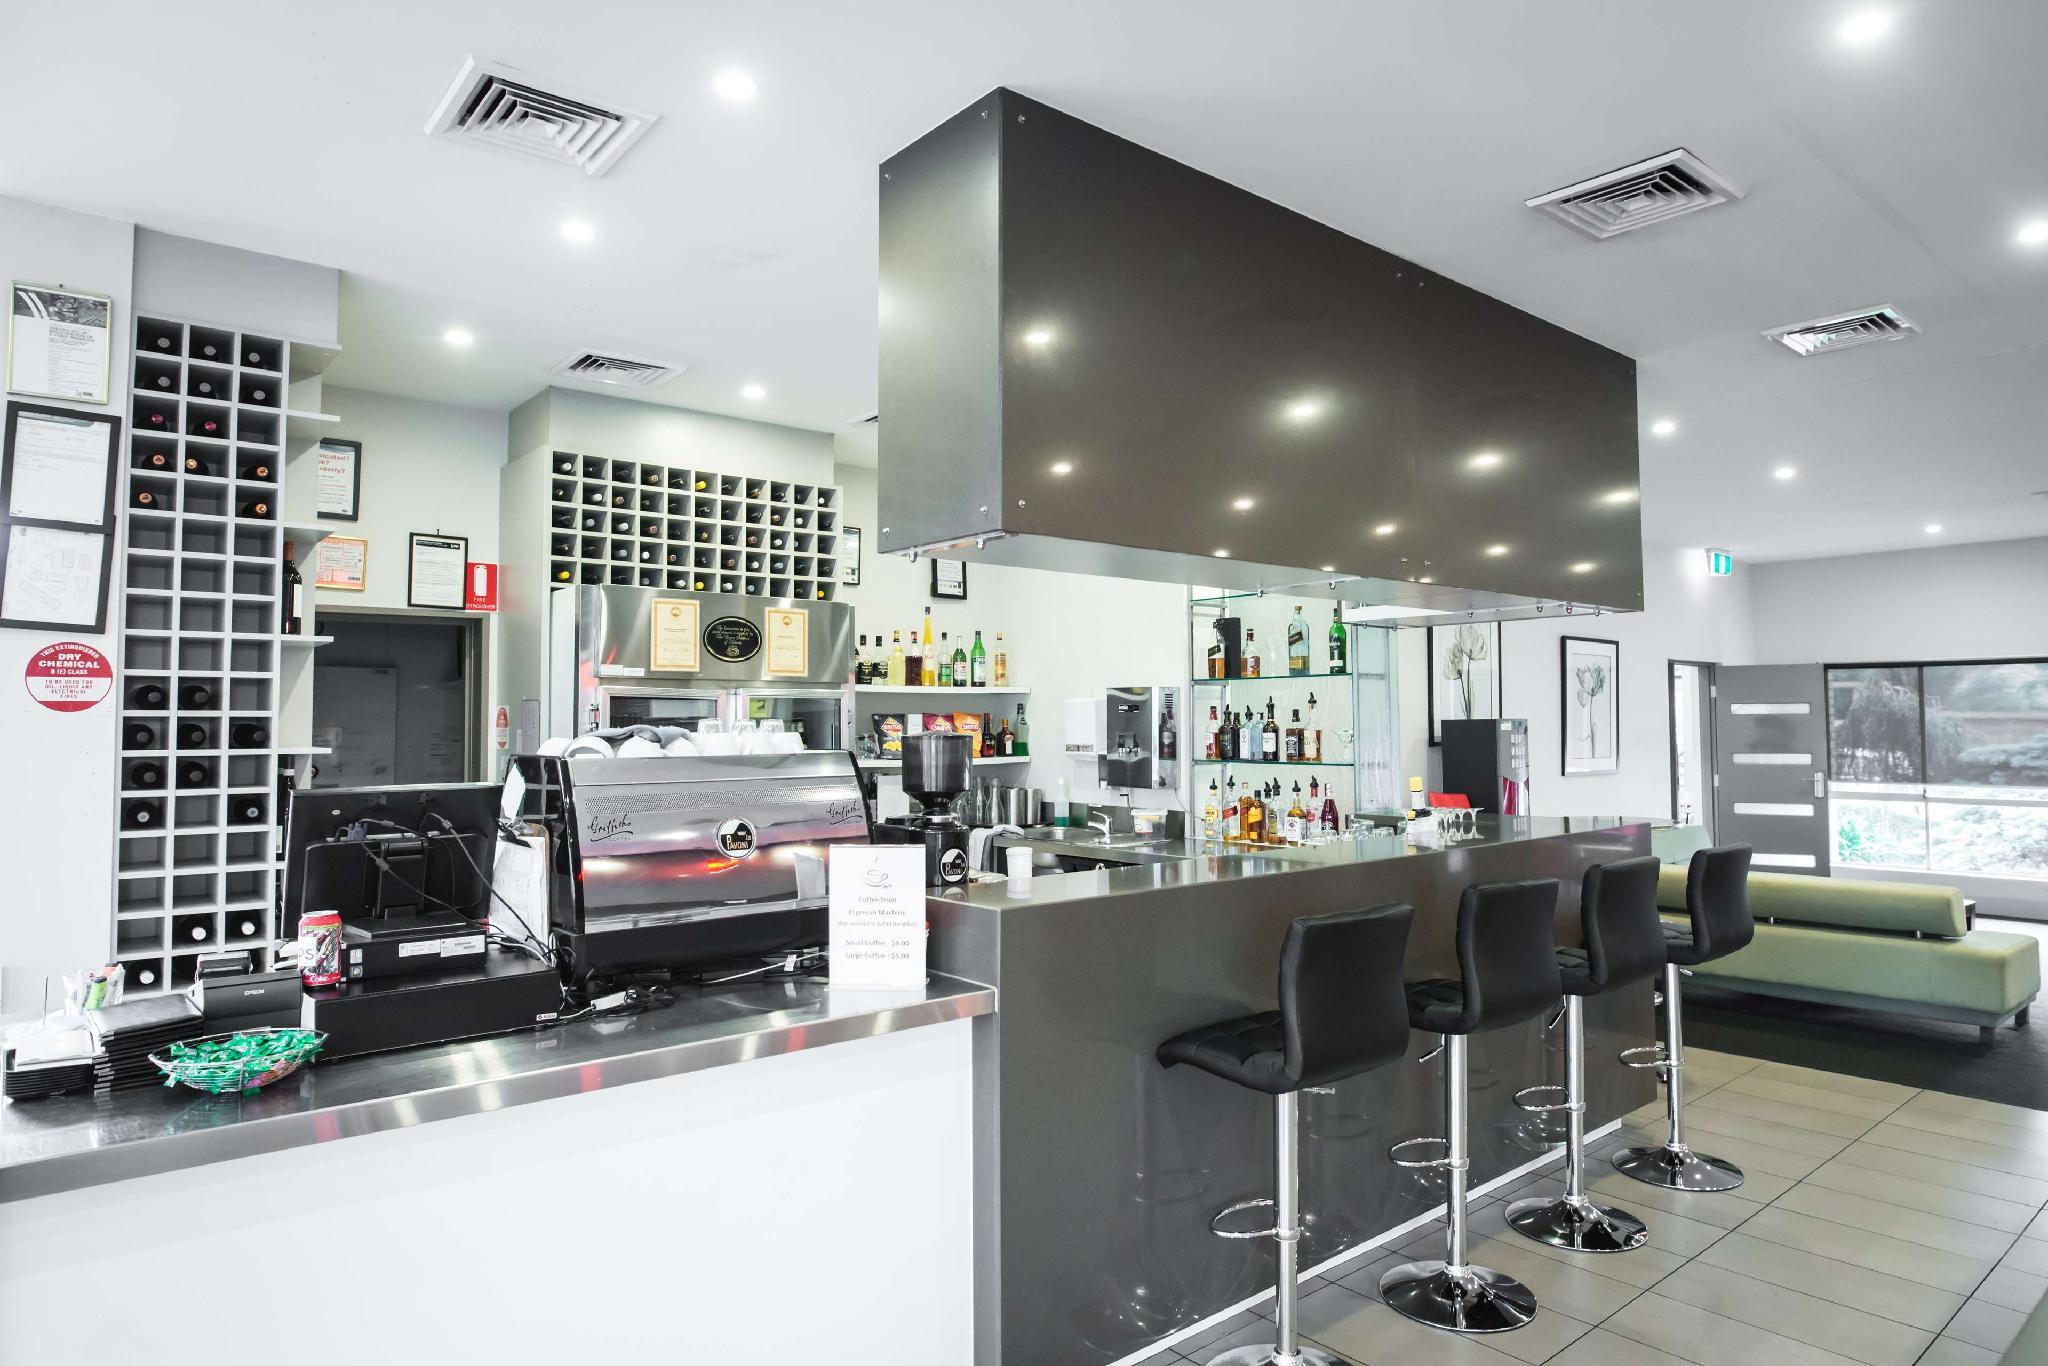 Best Western Melbourne Airport Motel and Convention, Hume - Craigieburn